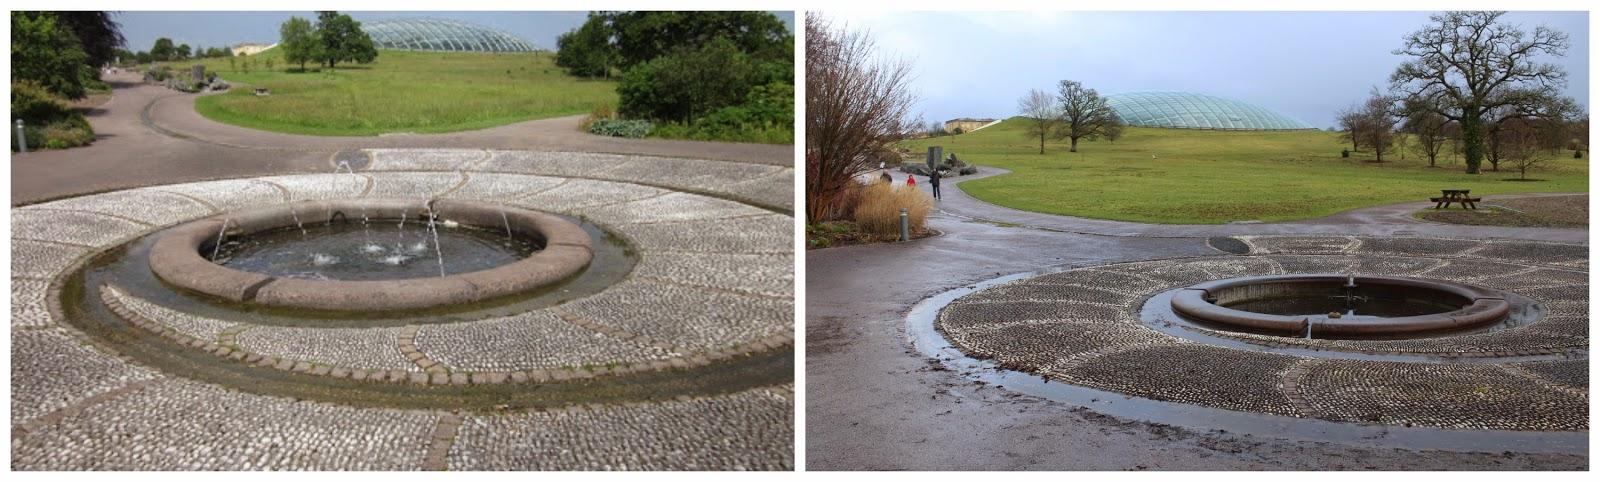 National Botanic Garden of Wales Summer & Winter scene